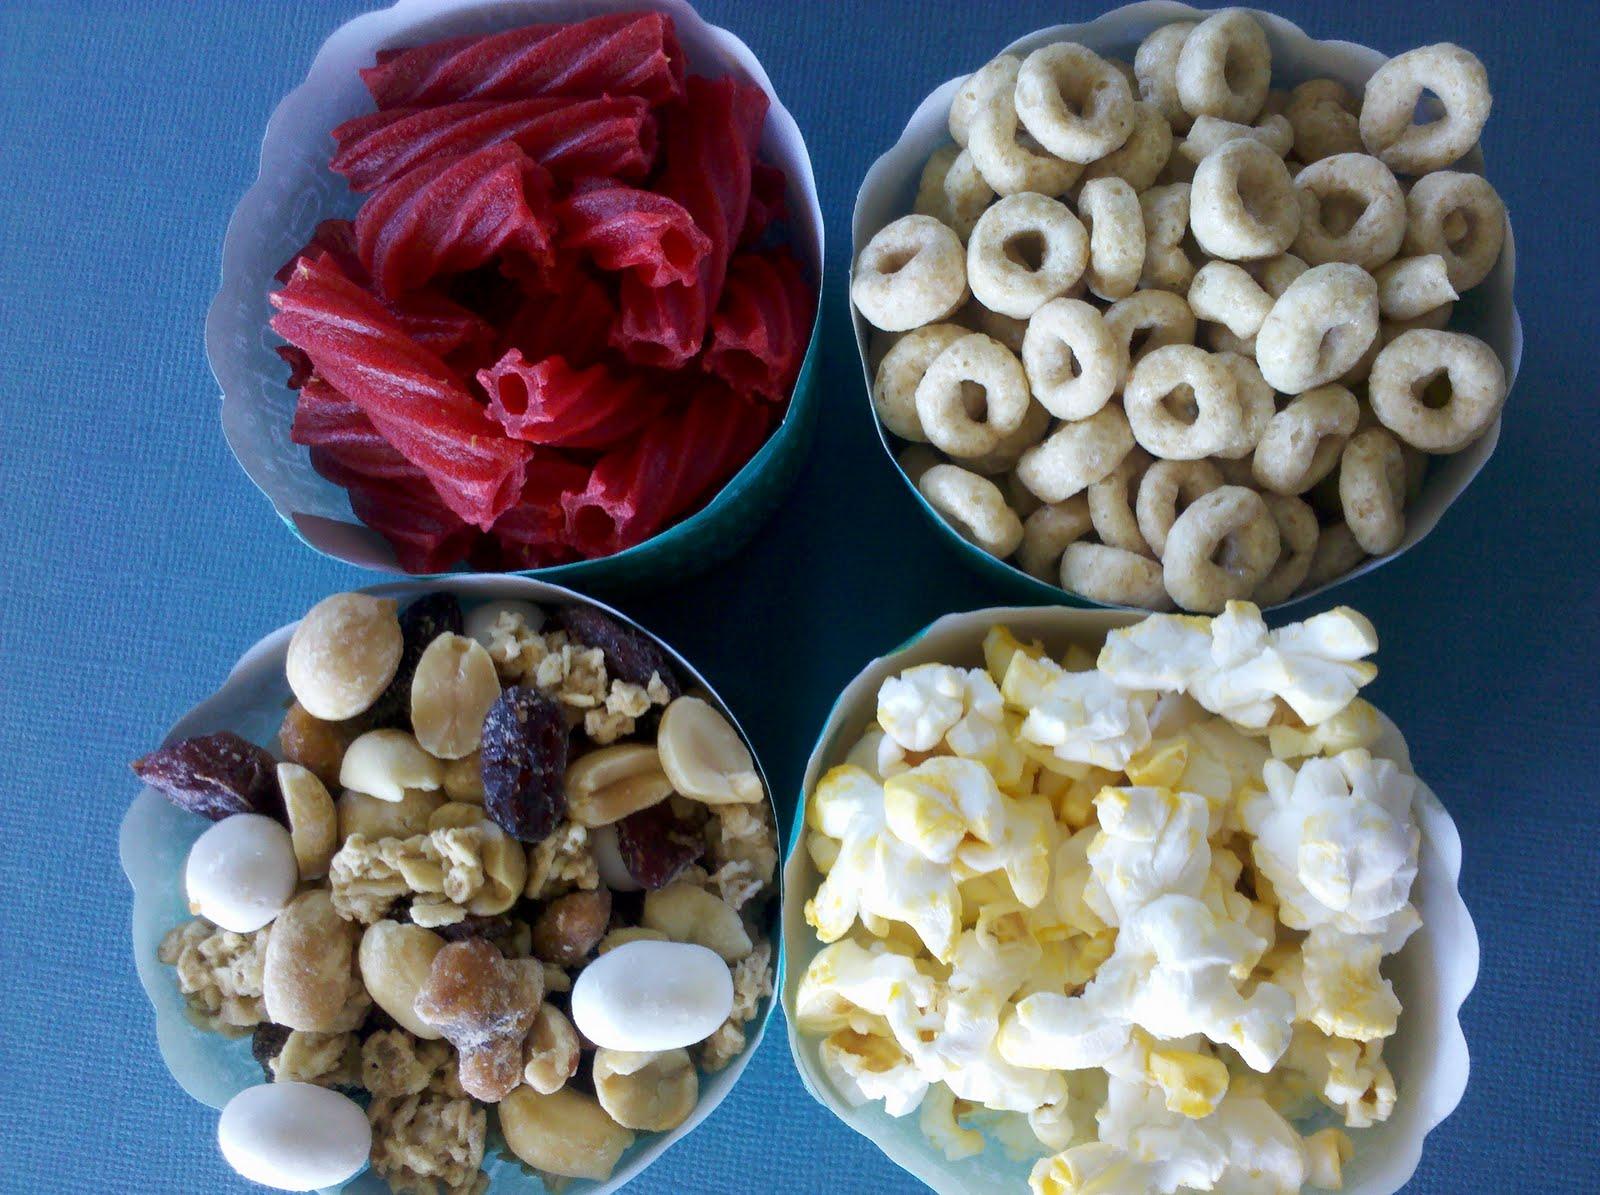 http://4.bp.blogspot.com/_bryxLa-WW5g/TH7bpagO4aI/AAAAAAAADU4/xOZ5YZ5tfBw/s1600/wilton+paper+cups+snacks+02.jpg